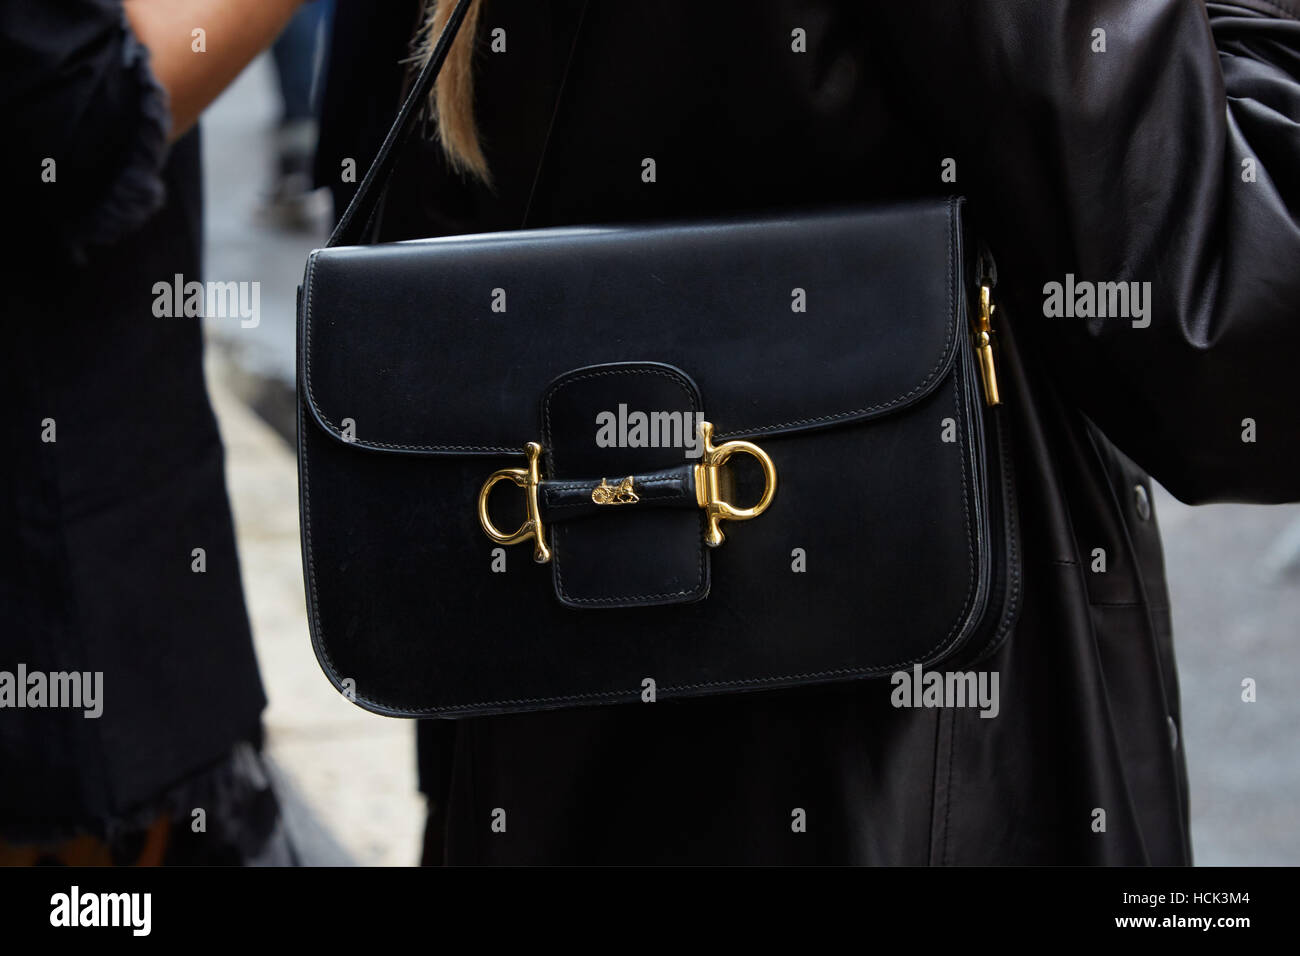 cc72cbcadcb9 Femme avec Hermes Sac en cuir noir avant de Wunderkind fashion show, Milan Fashion  Week